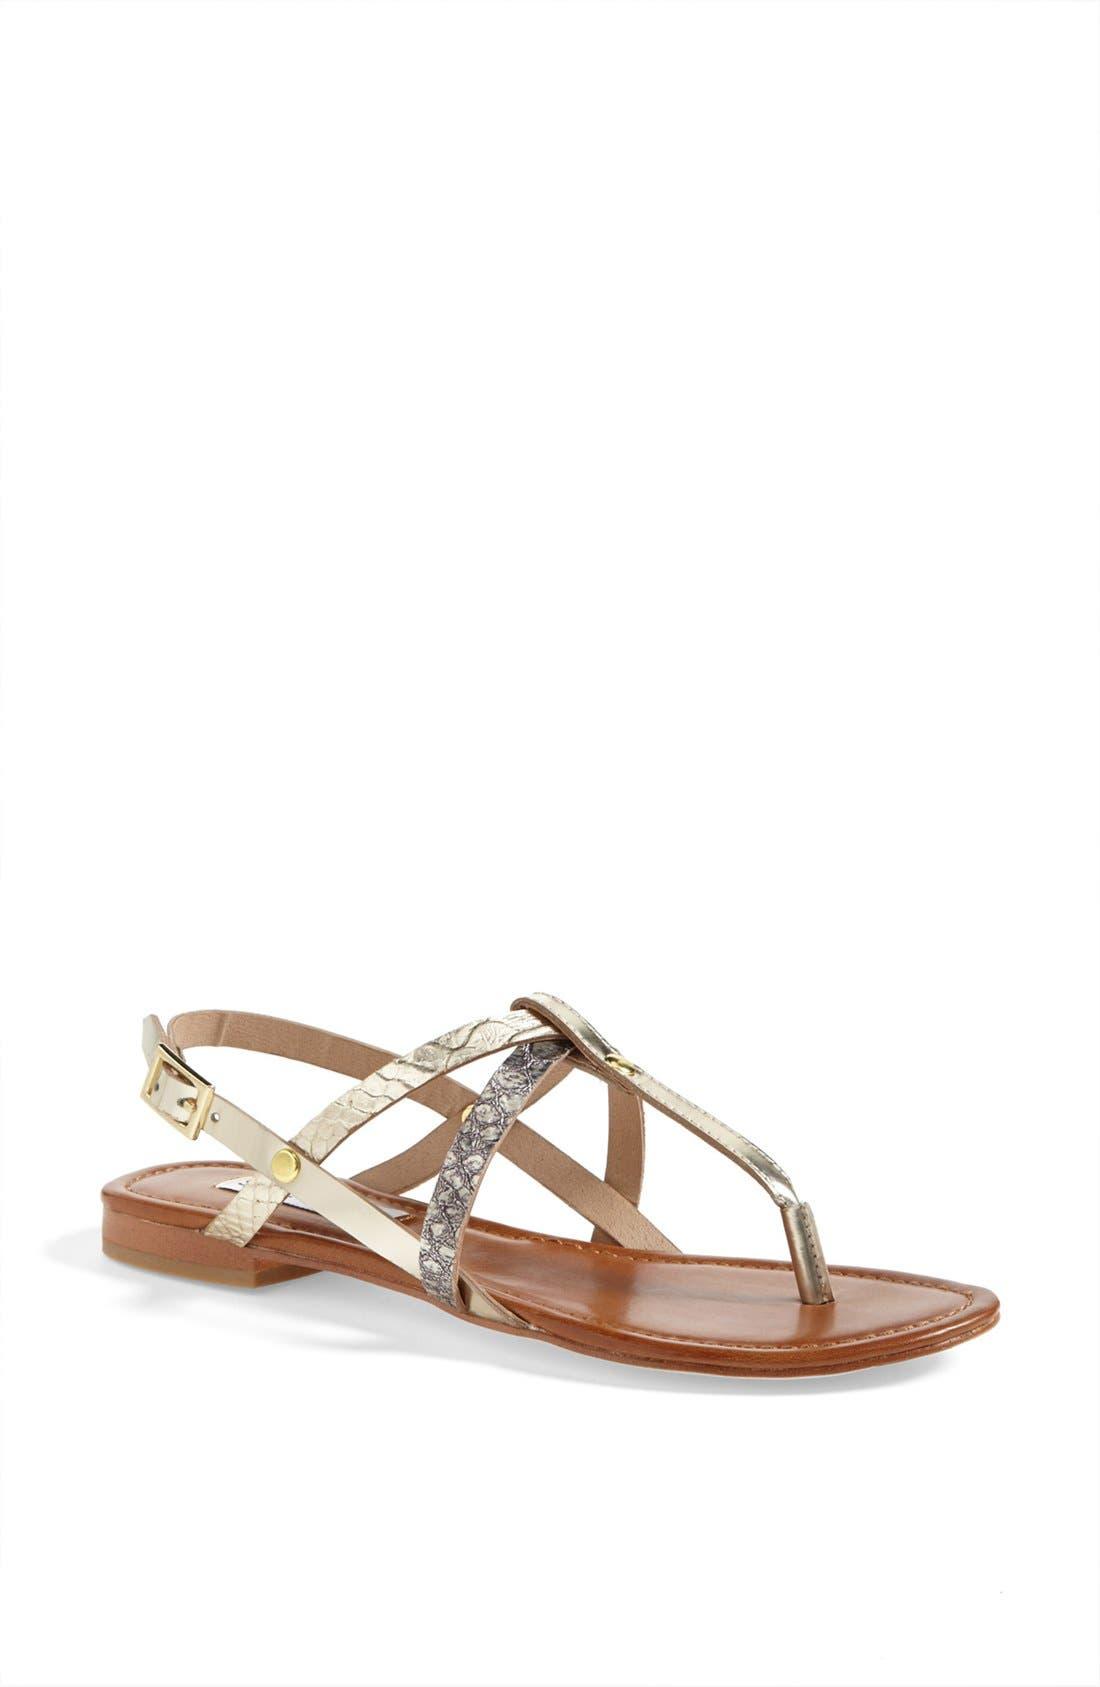 Main Image - Steve Madden 'Kroatia' Leather Sandal